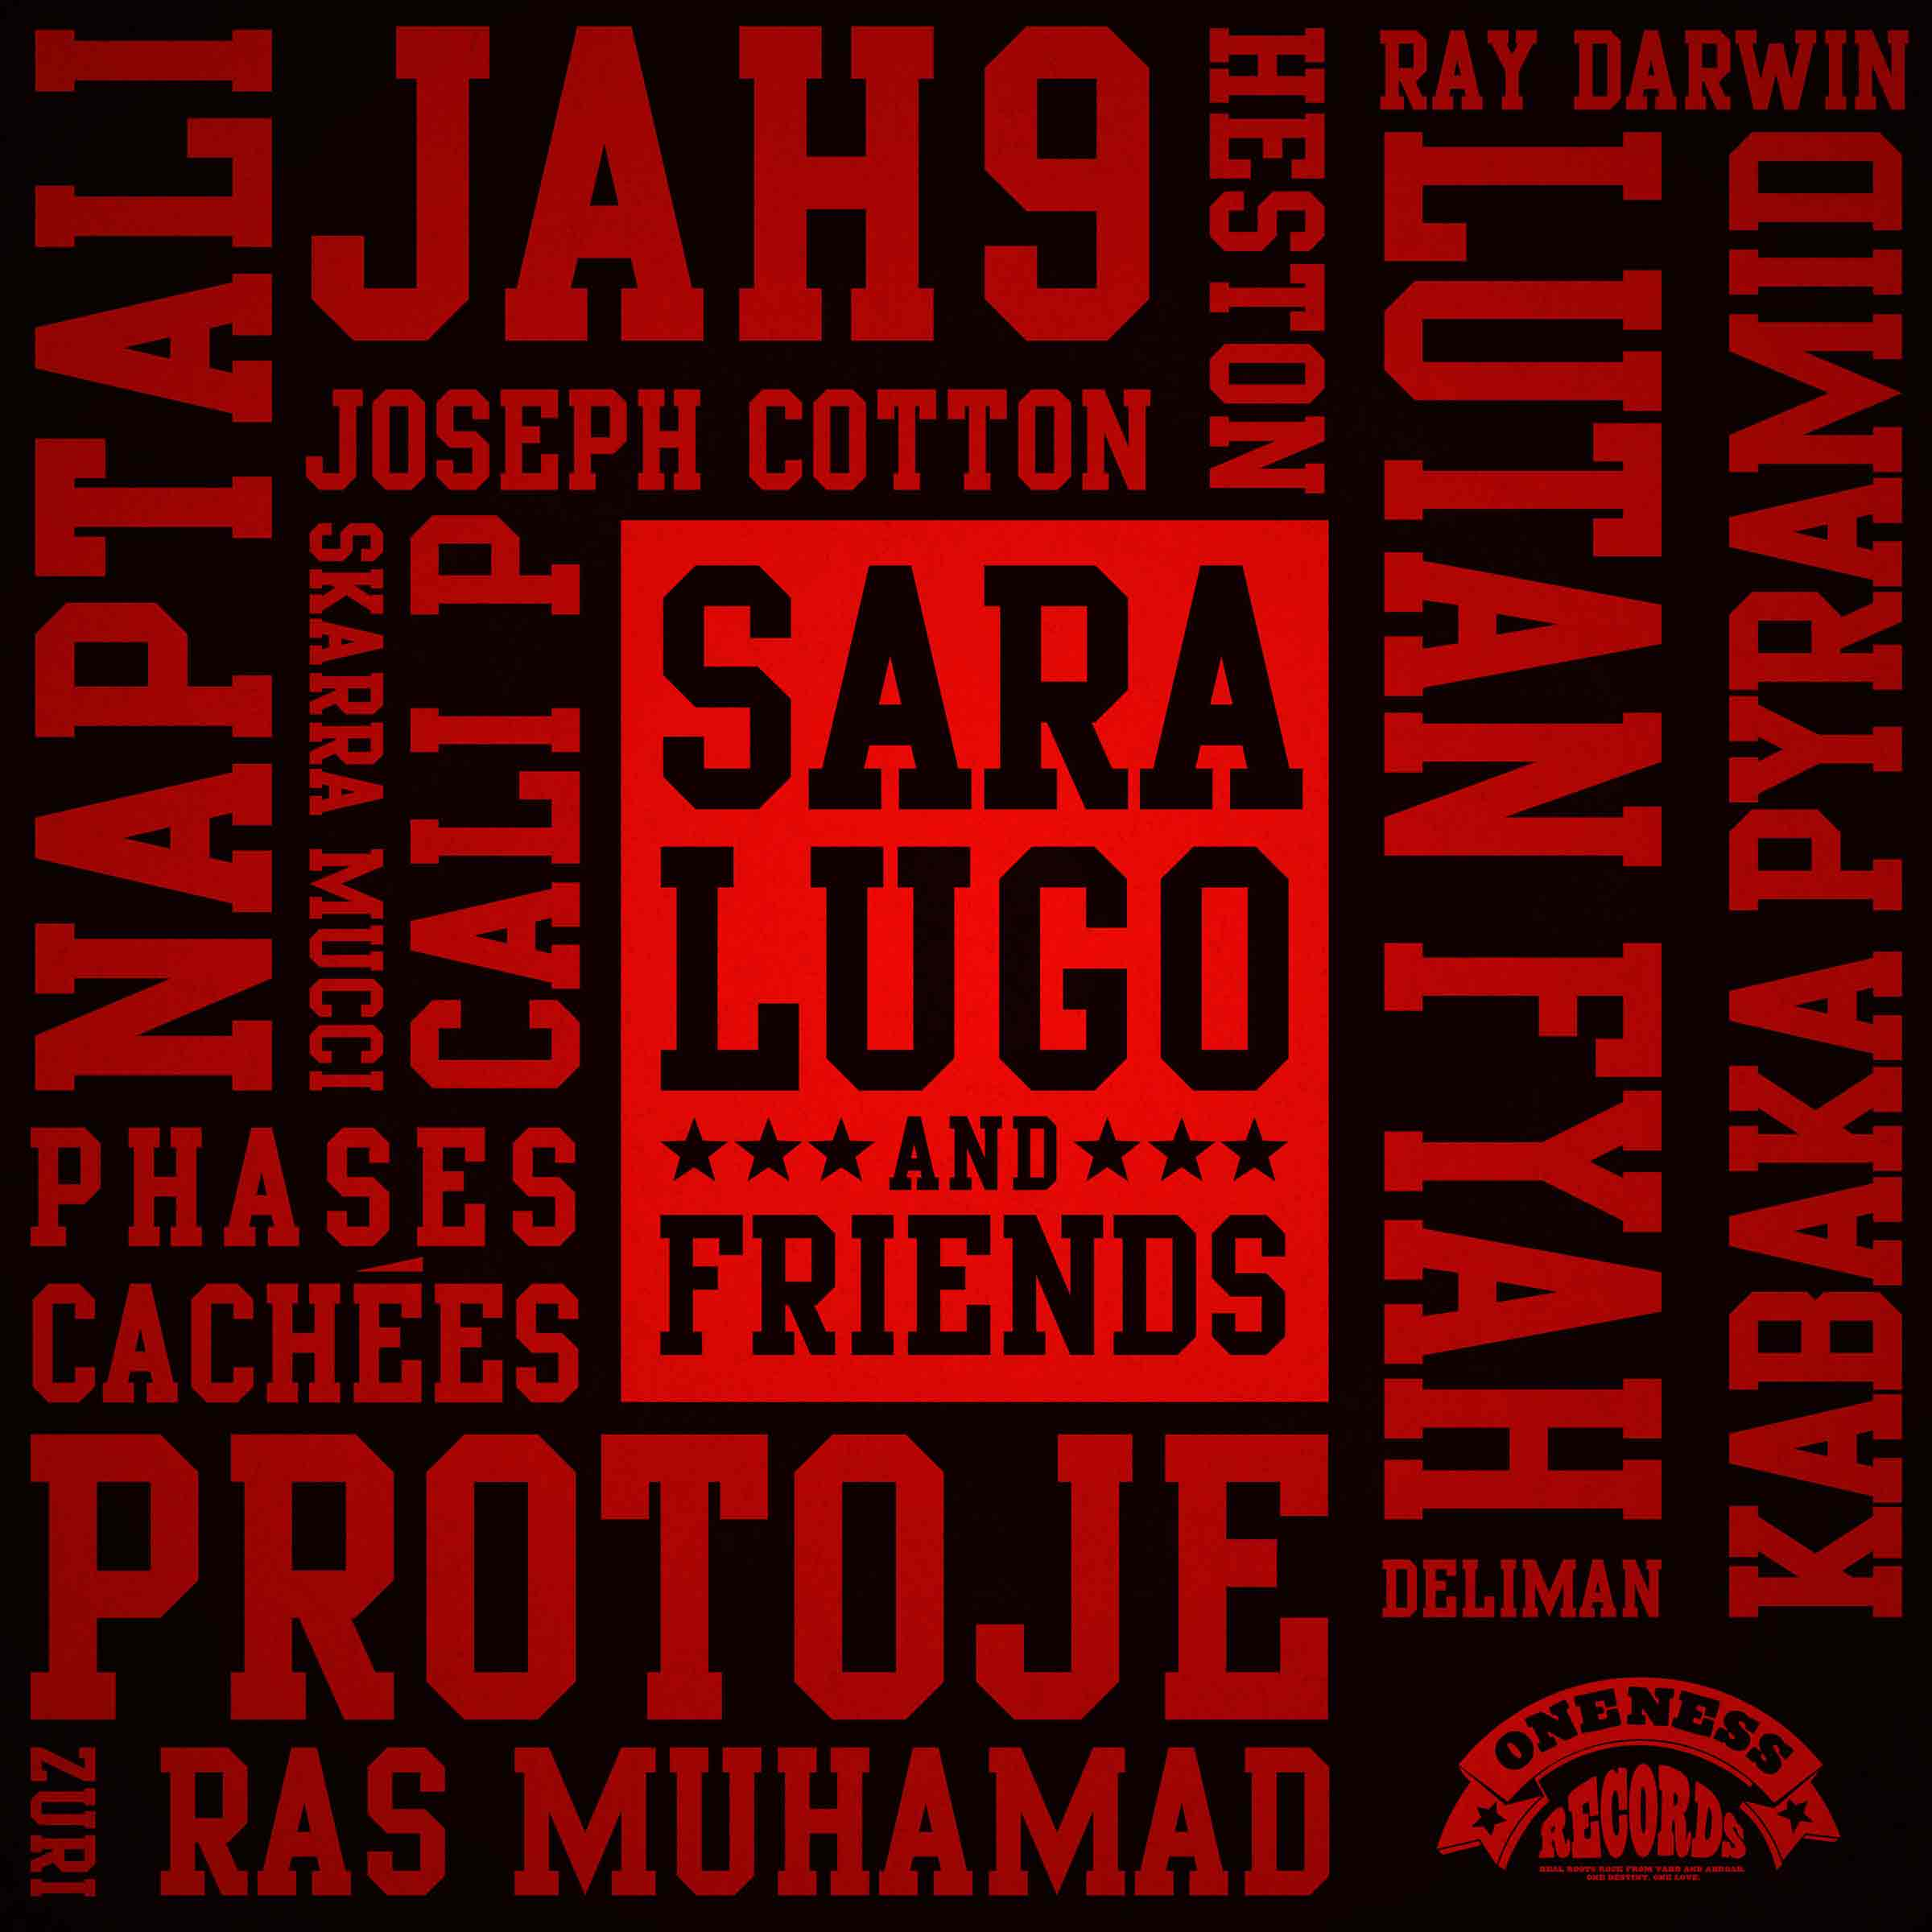 saracoverweb